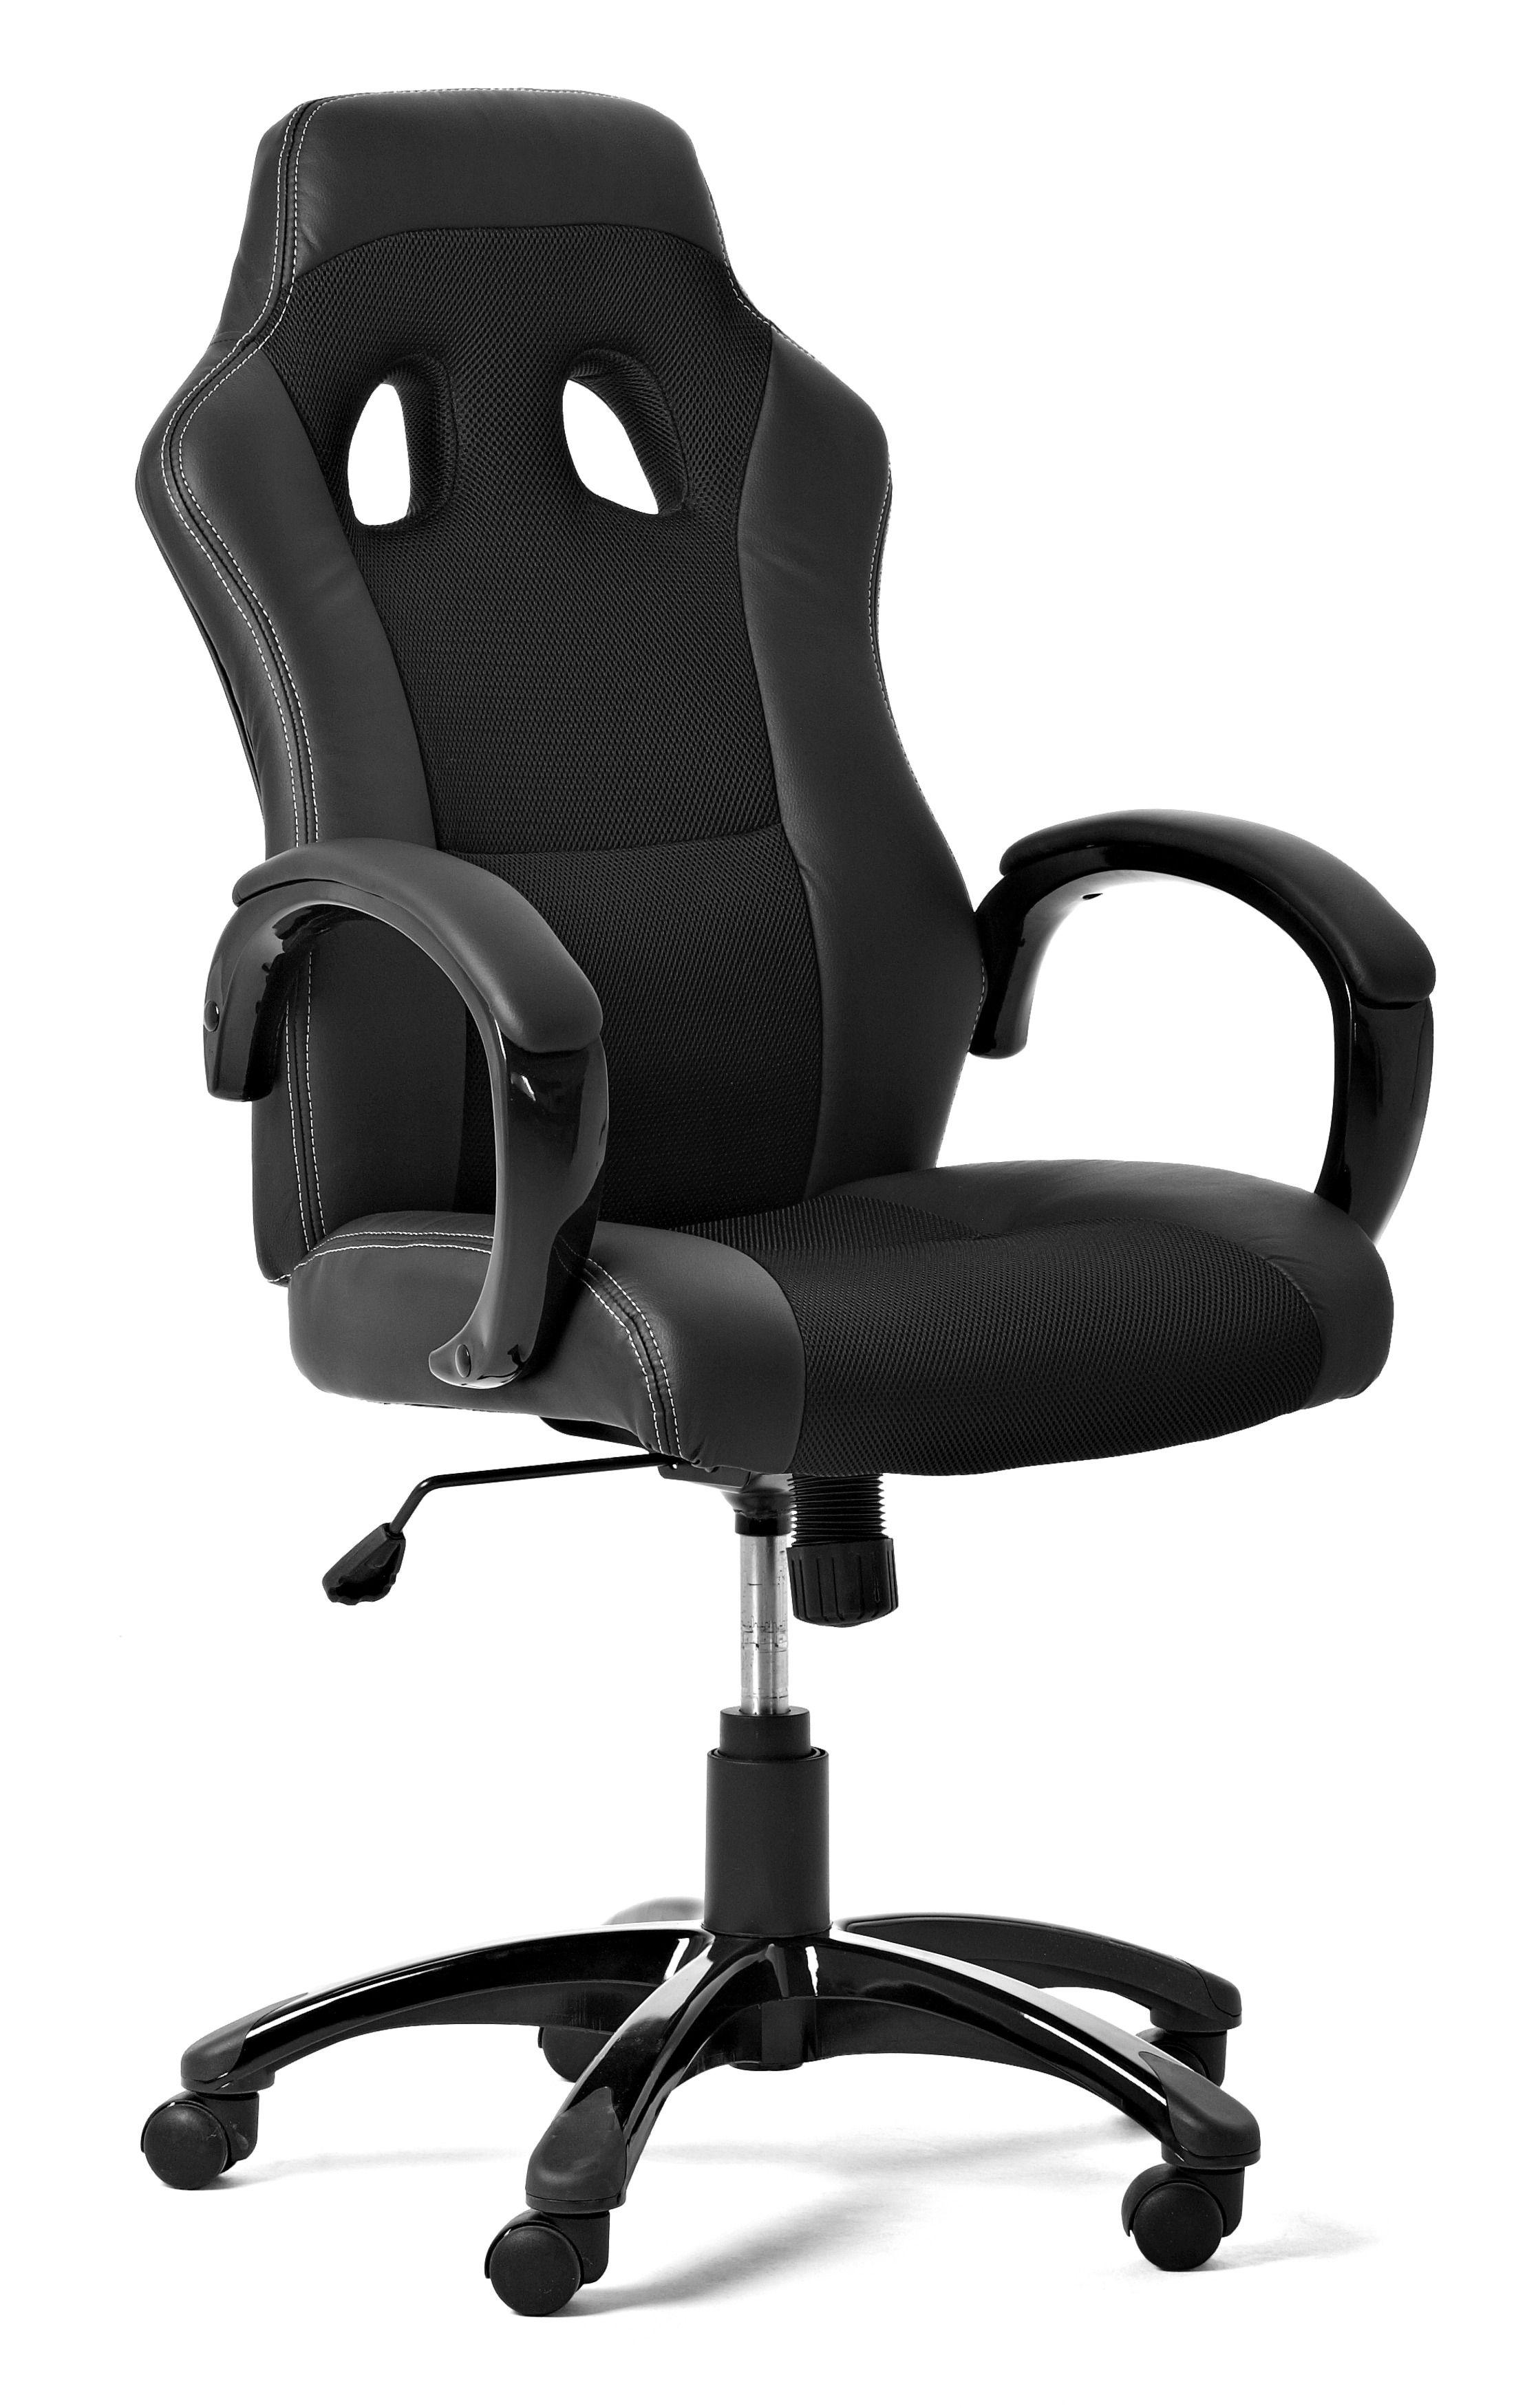 desk chair jysk swing indoor race write imitation leather black height